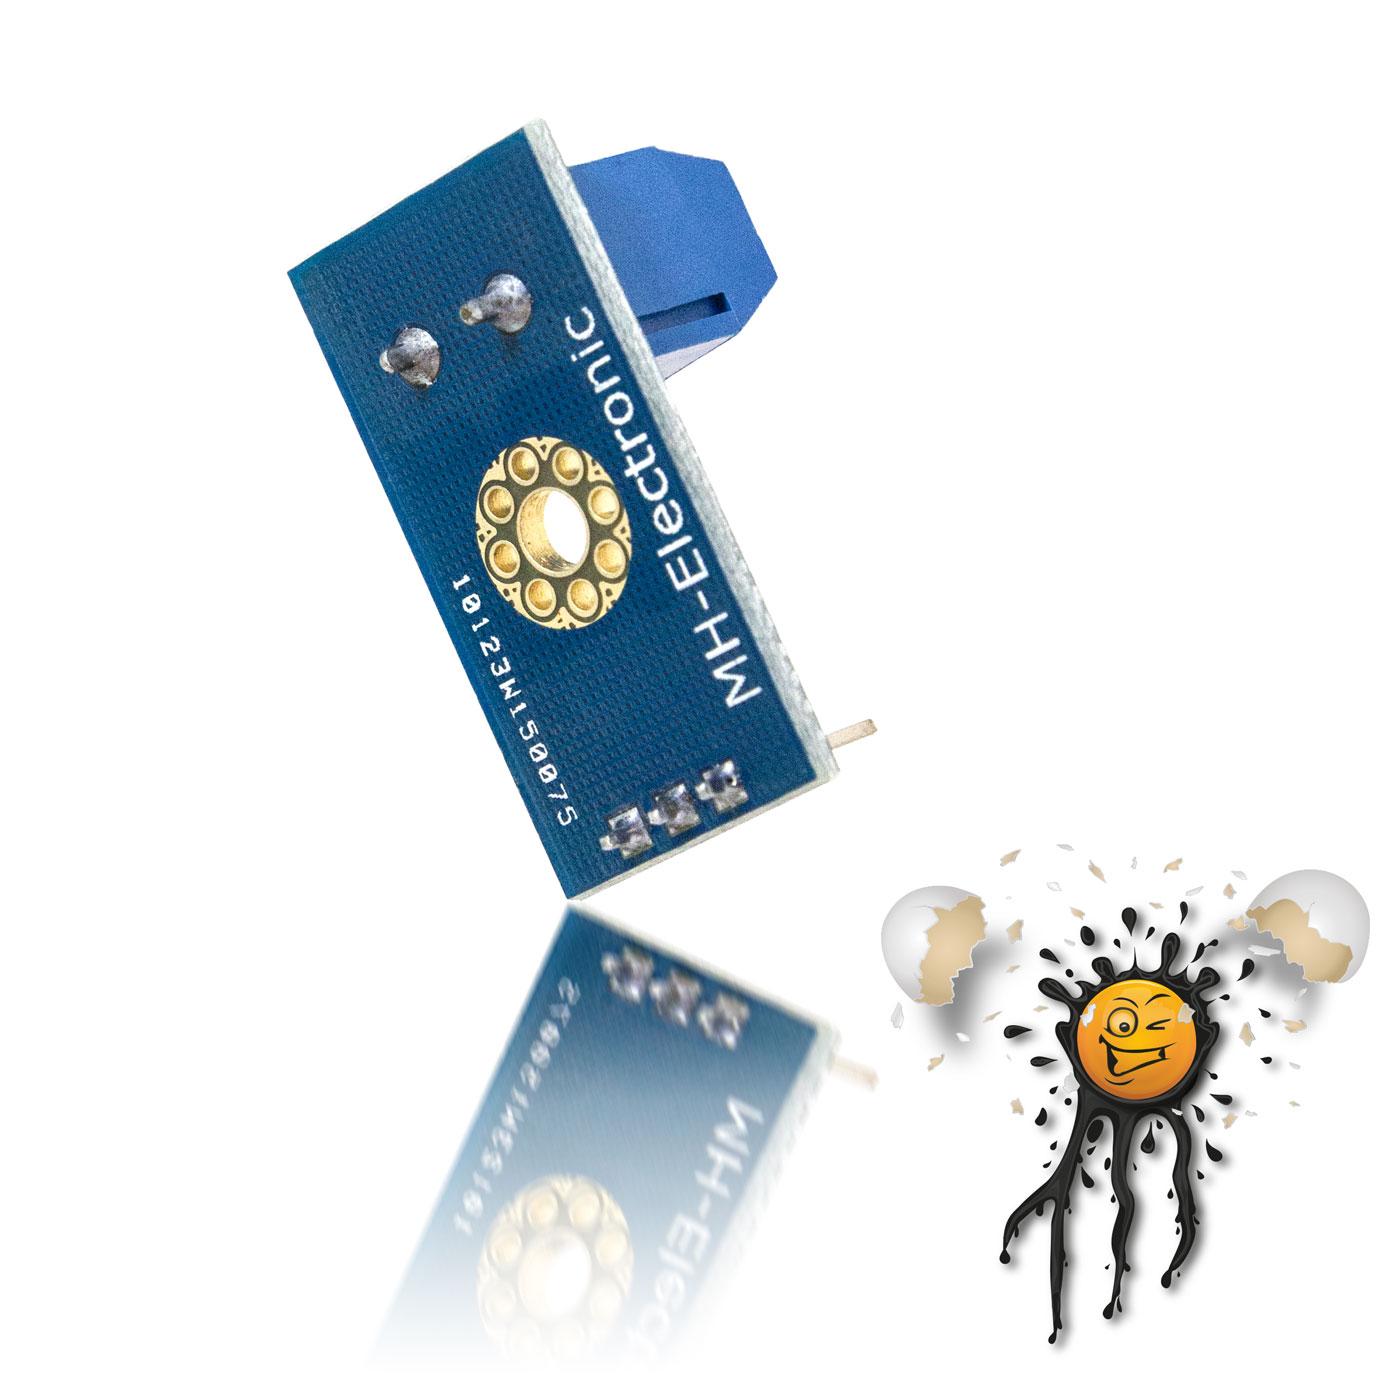 Spannungssensor 0-25 Volt Rückseite